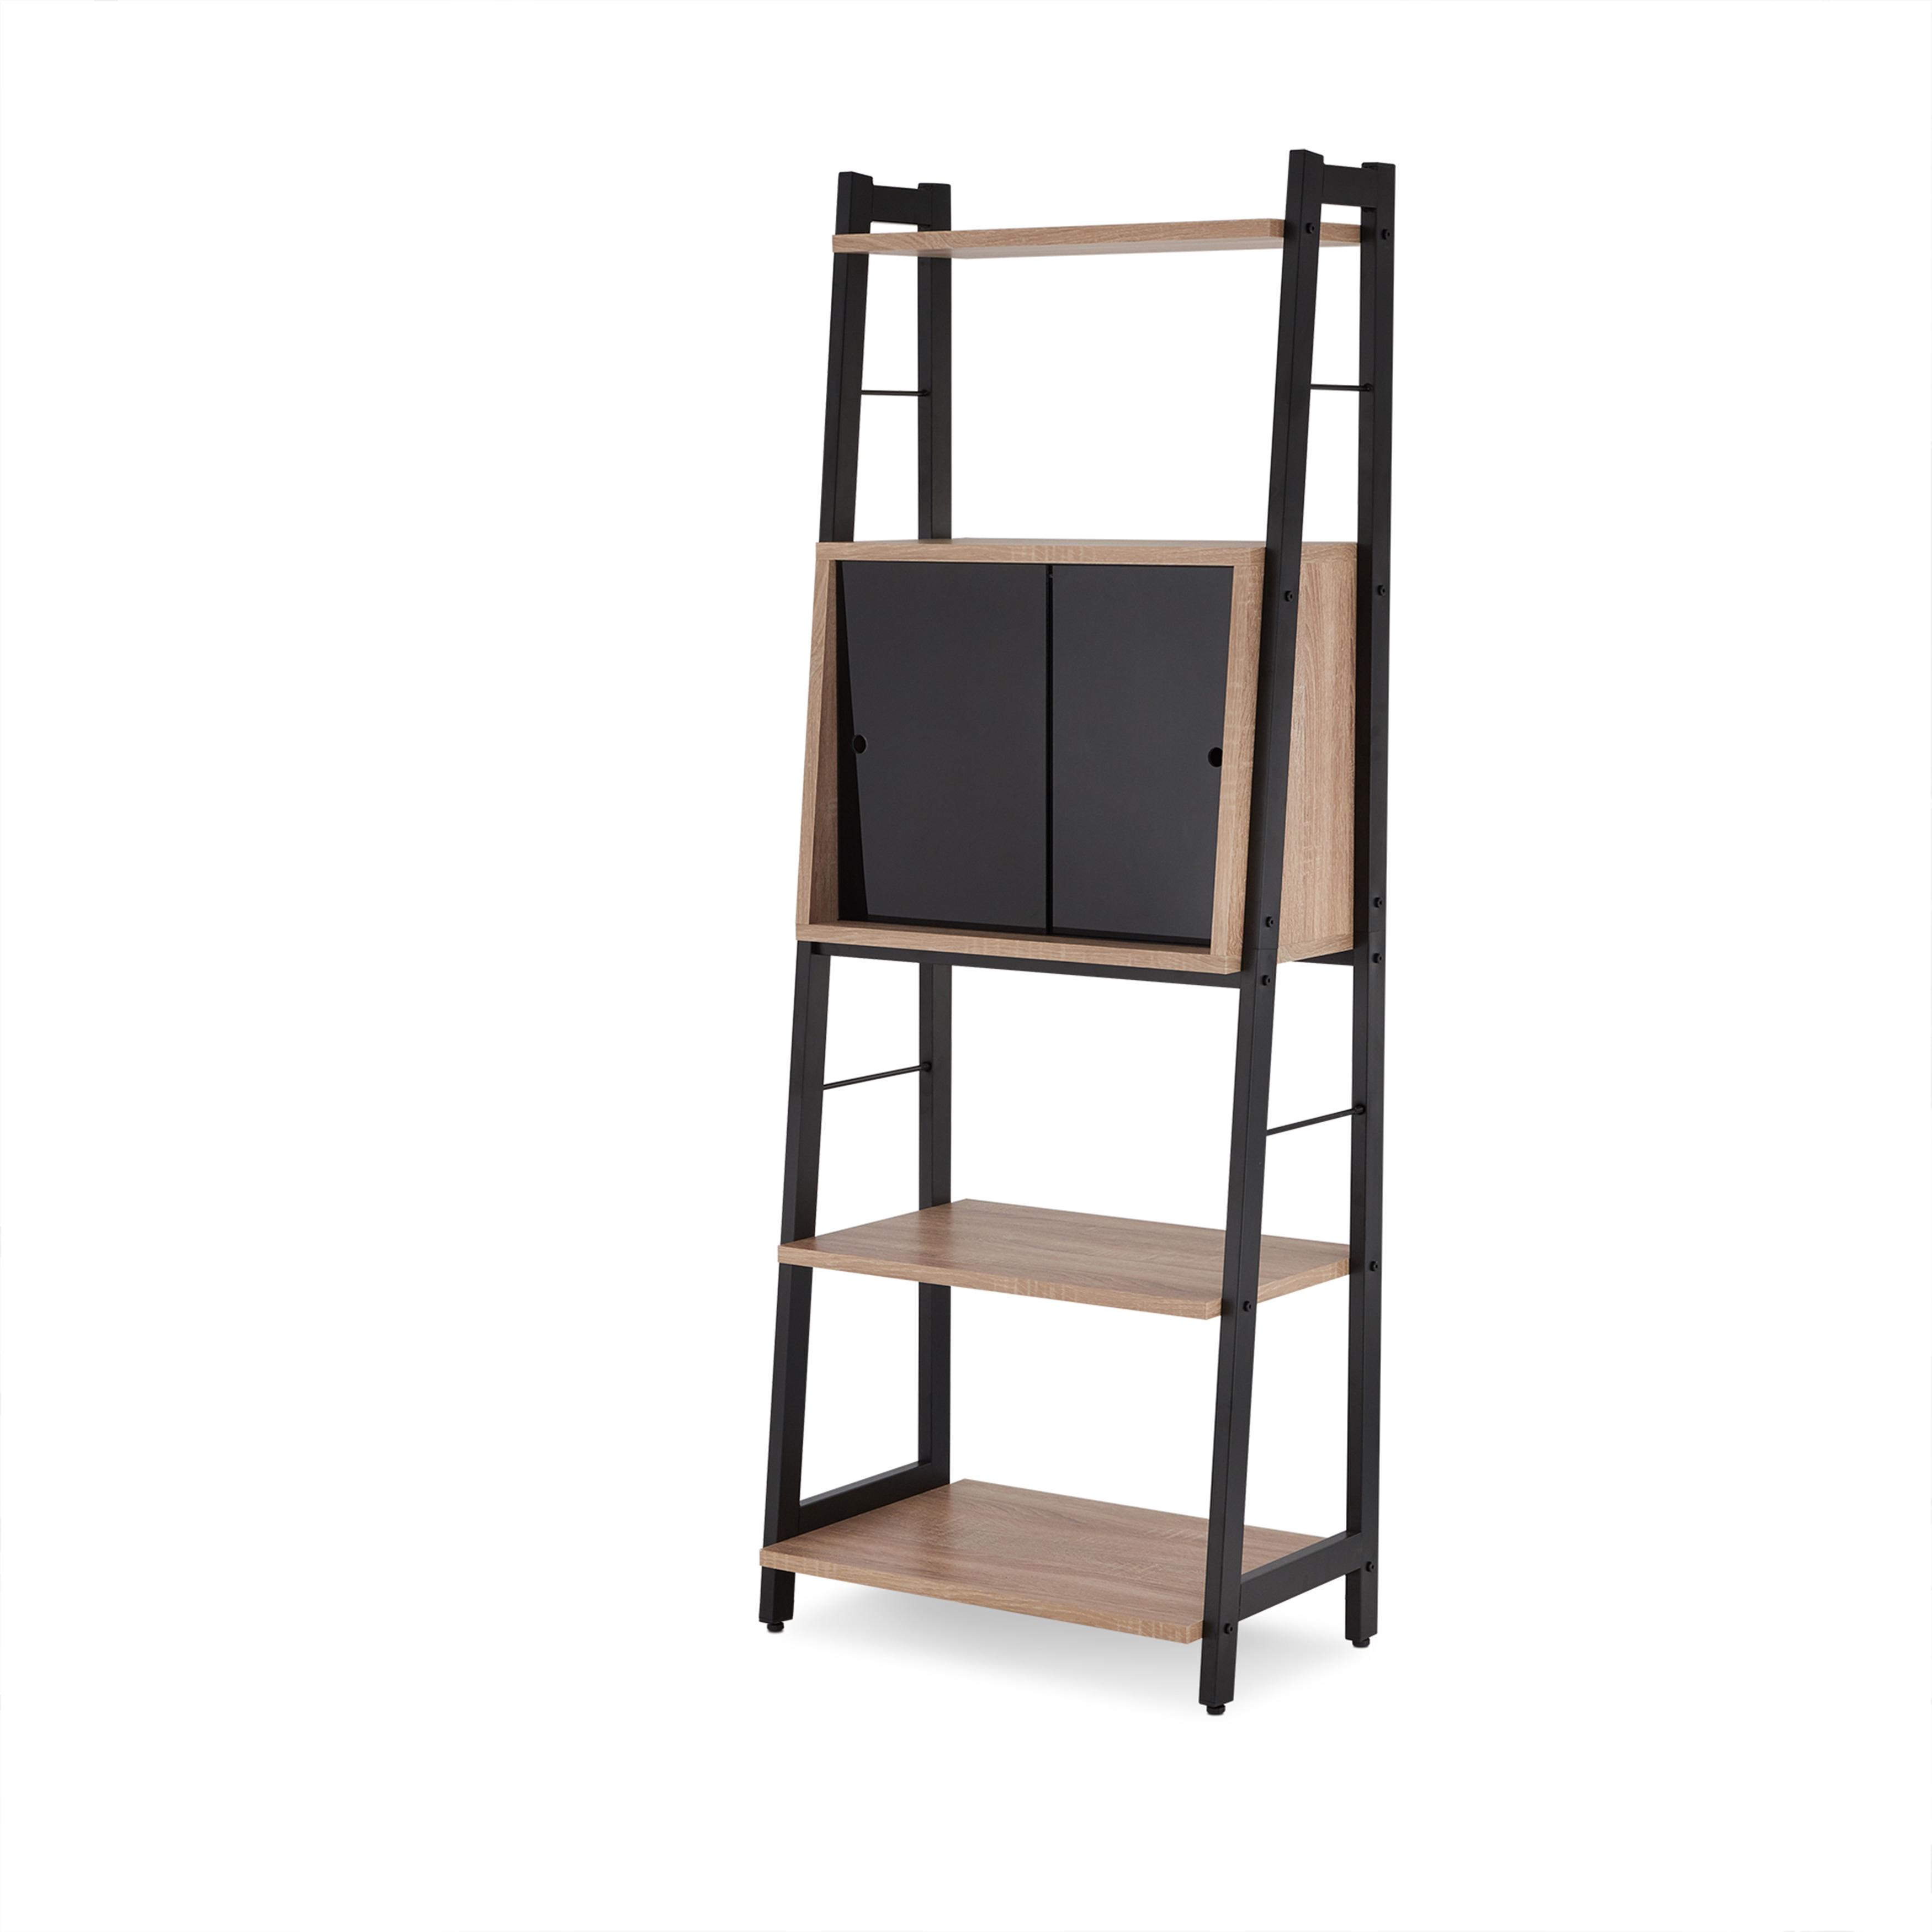 Shop Acme Furniture Finis Leaning Bookshelf With Sliding Door